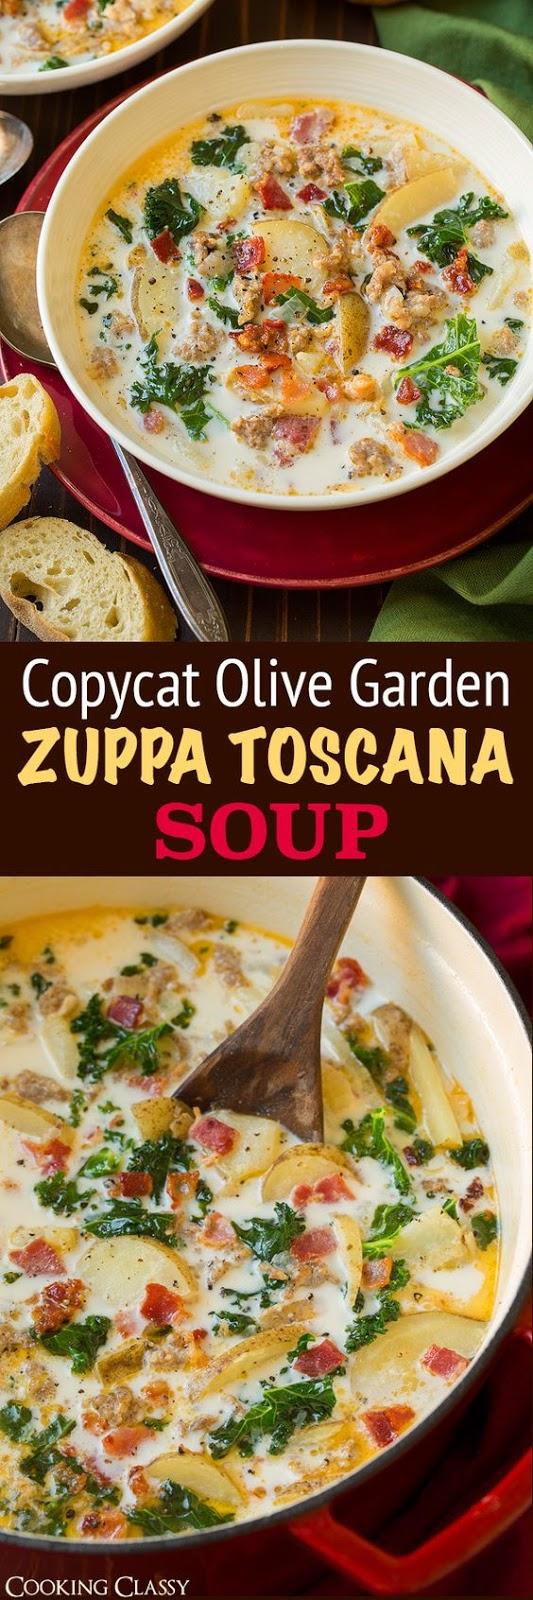 Zuppa Toscana Soup (Olive Garden Copycat) – Cucina de Yung